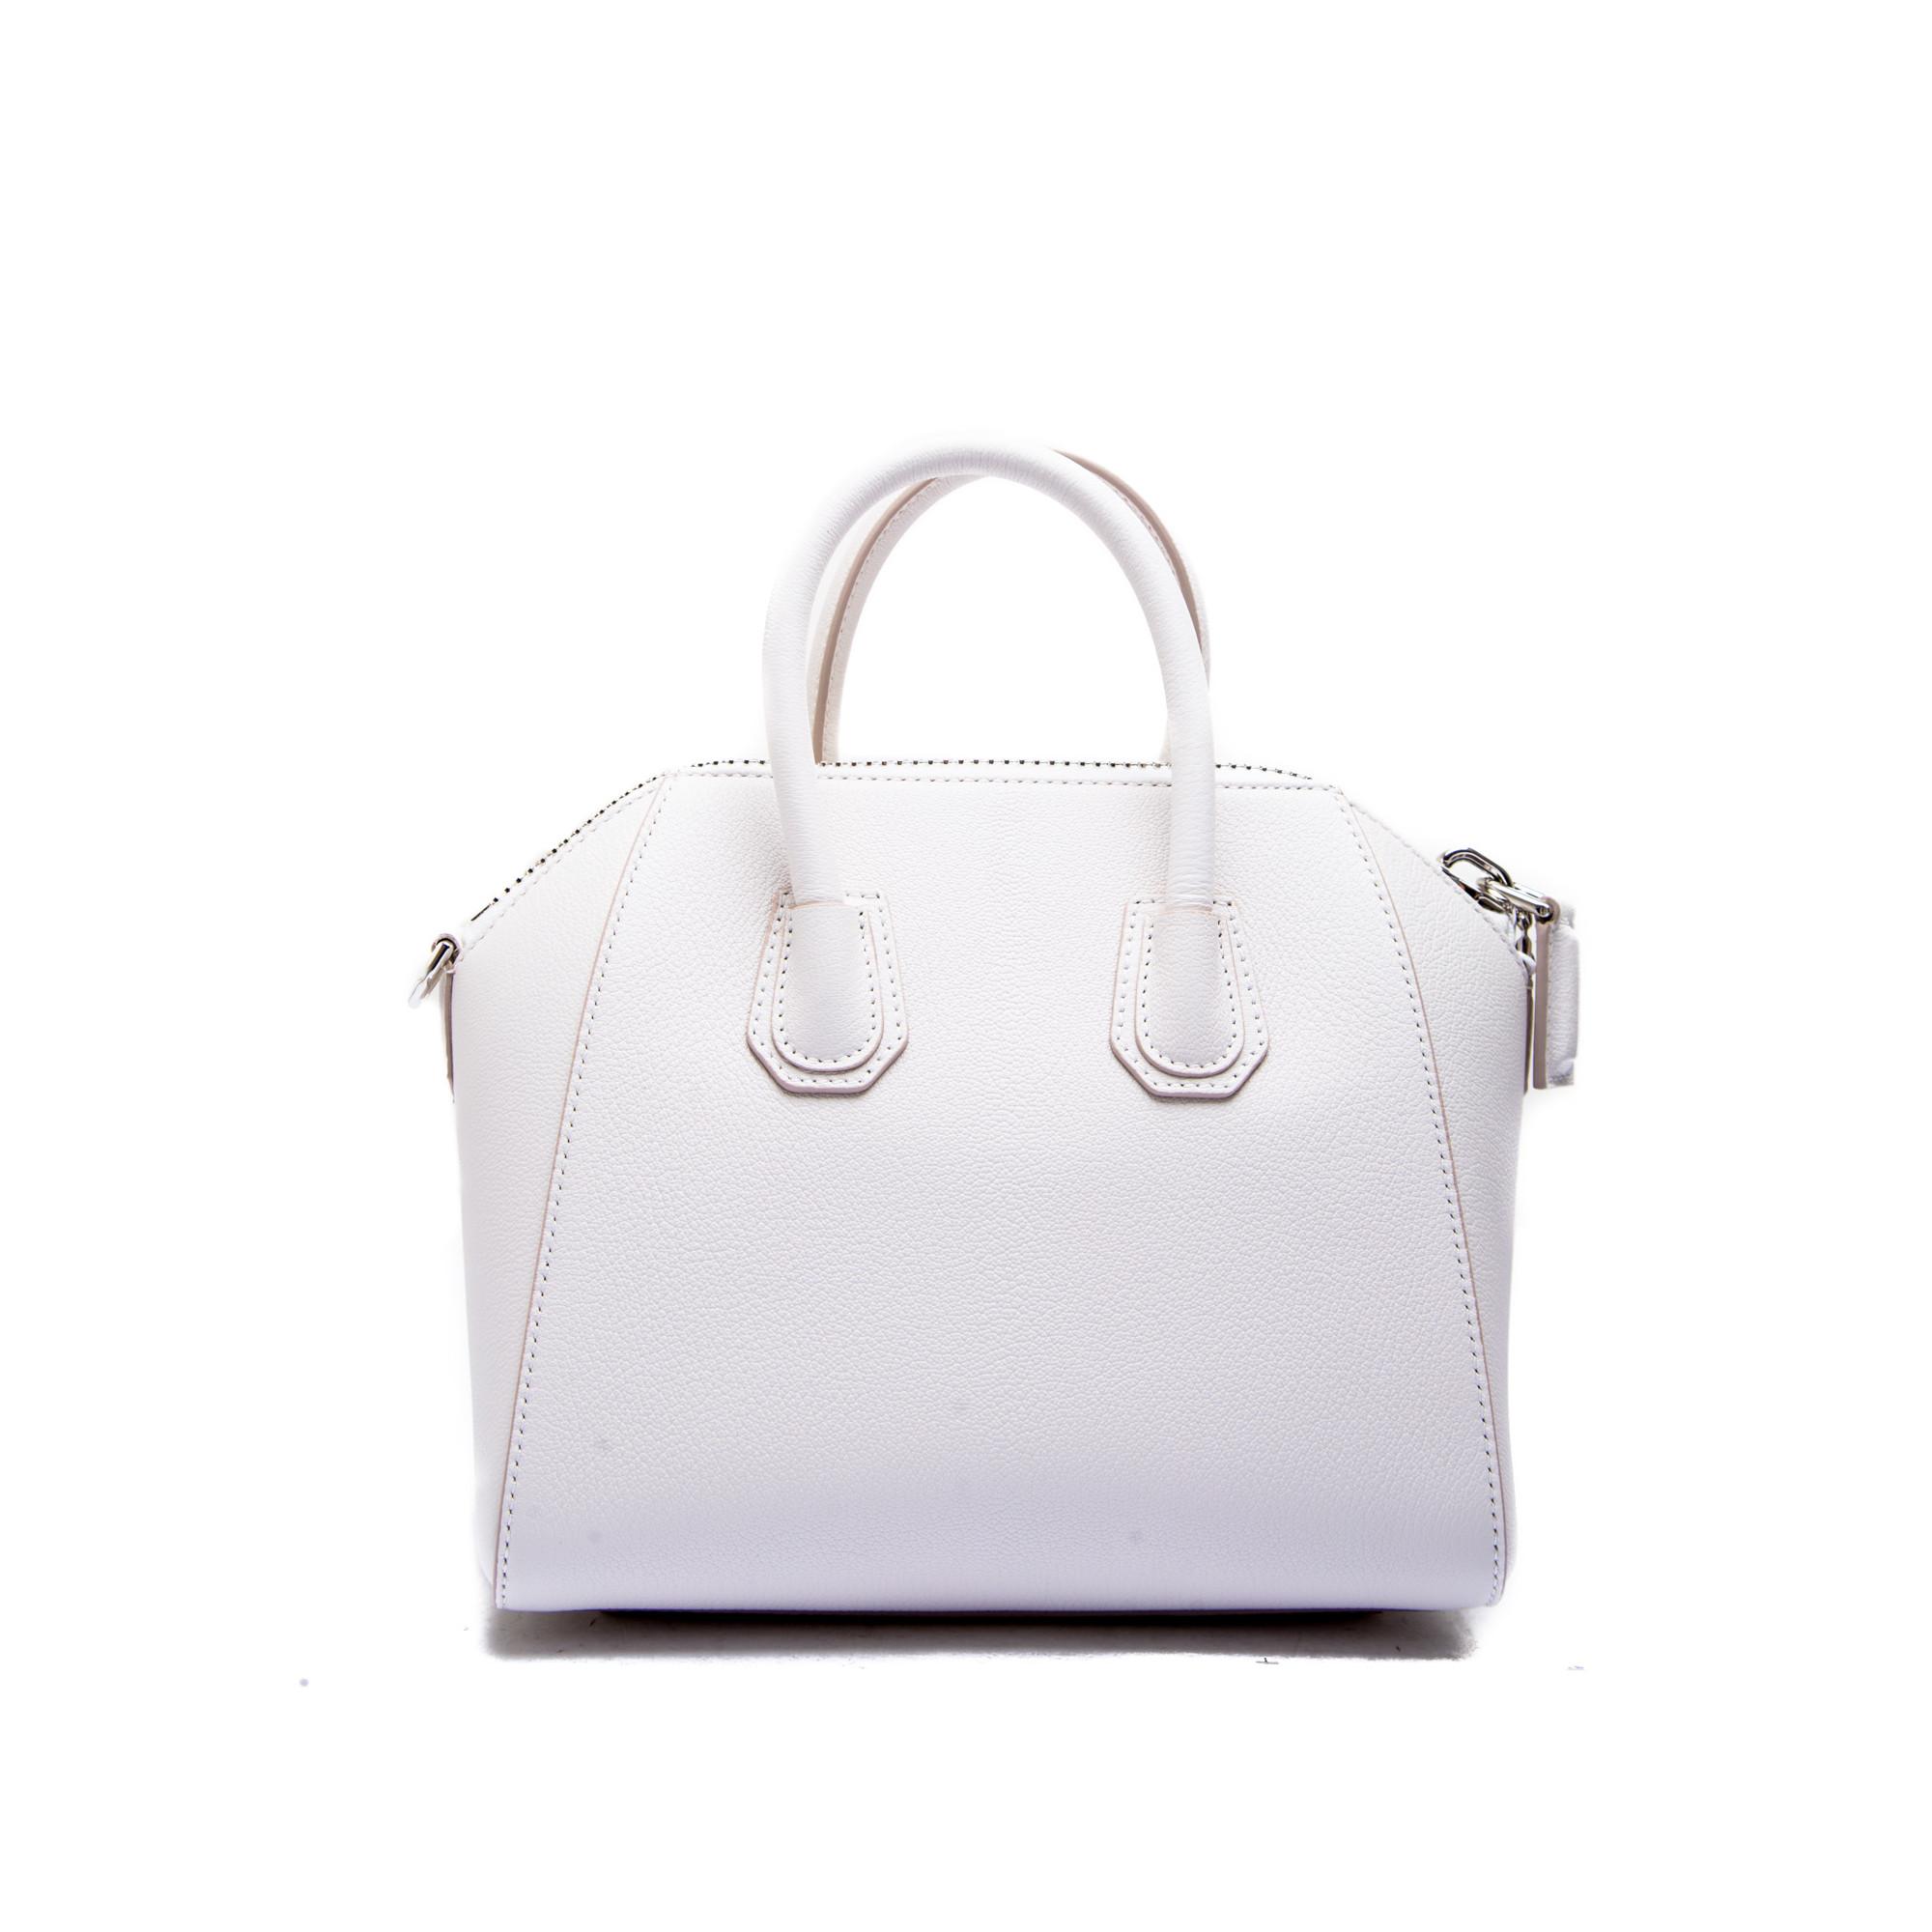 7c961915ce ... Givenchy antigona bag white Givenchy antigona bag white -  www.derodeloper.com - Derodeloper ...